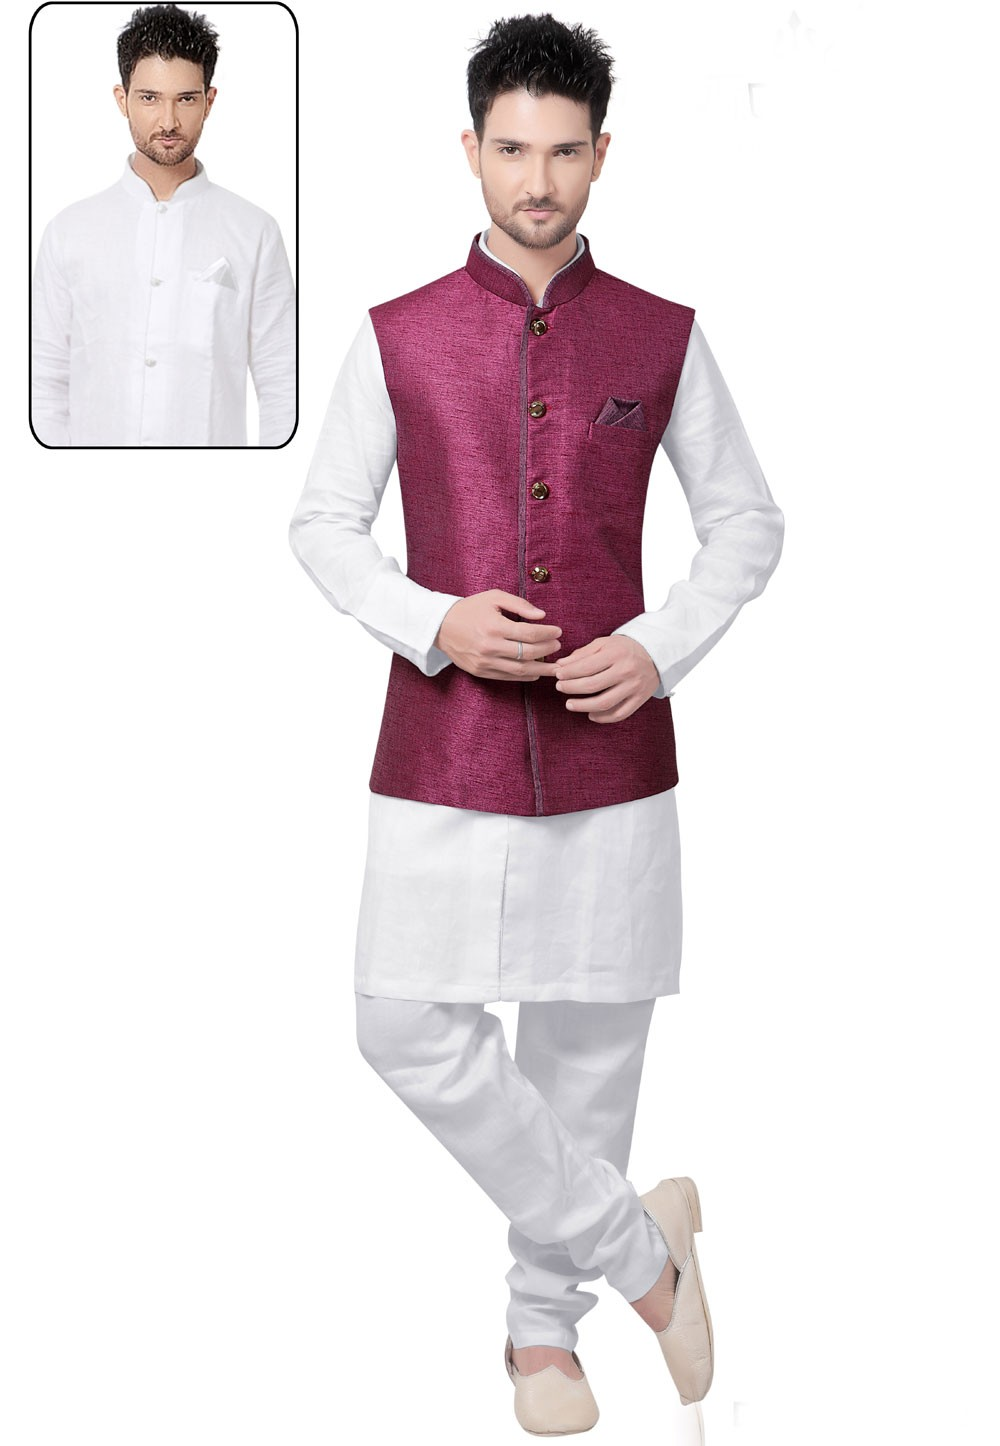 Men's Linen,Jute White,Purple Color Readymade Kurta Pyjama With Jacket.